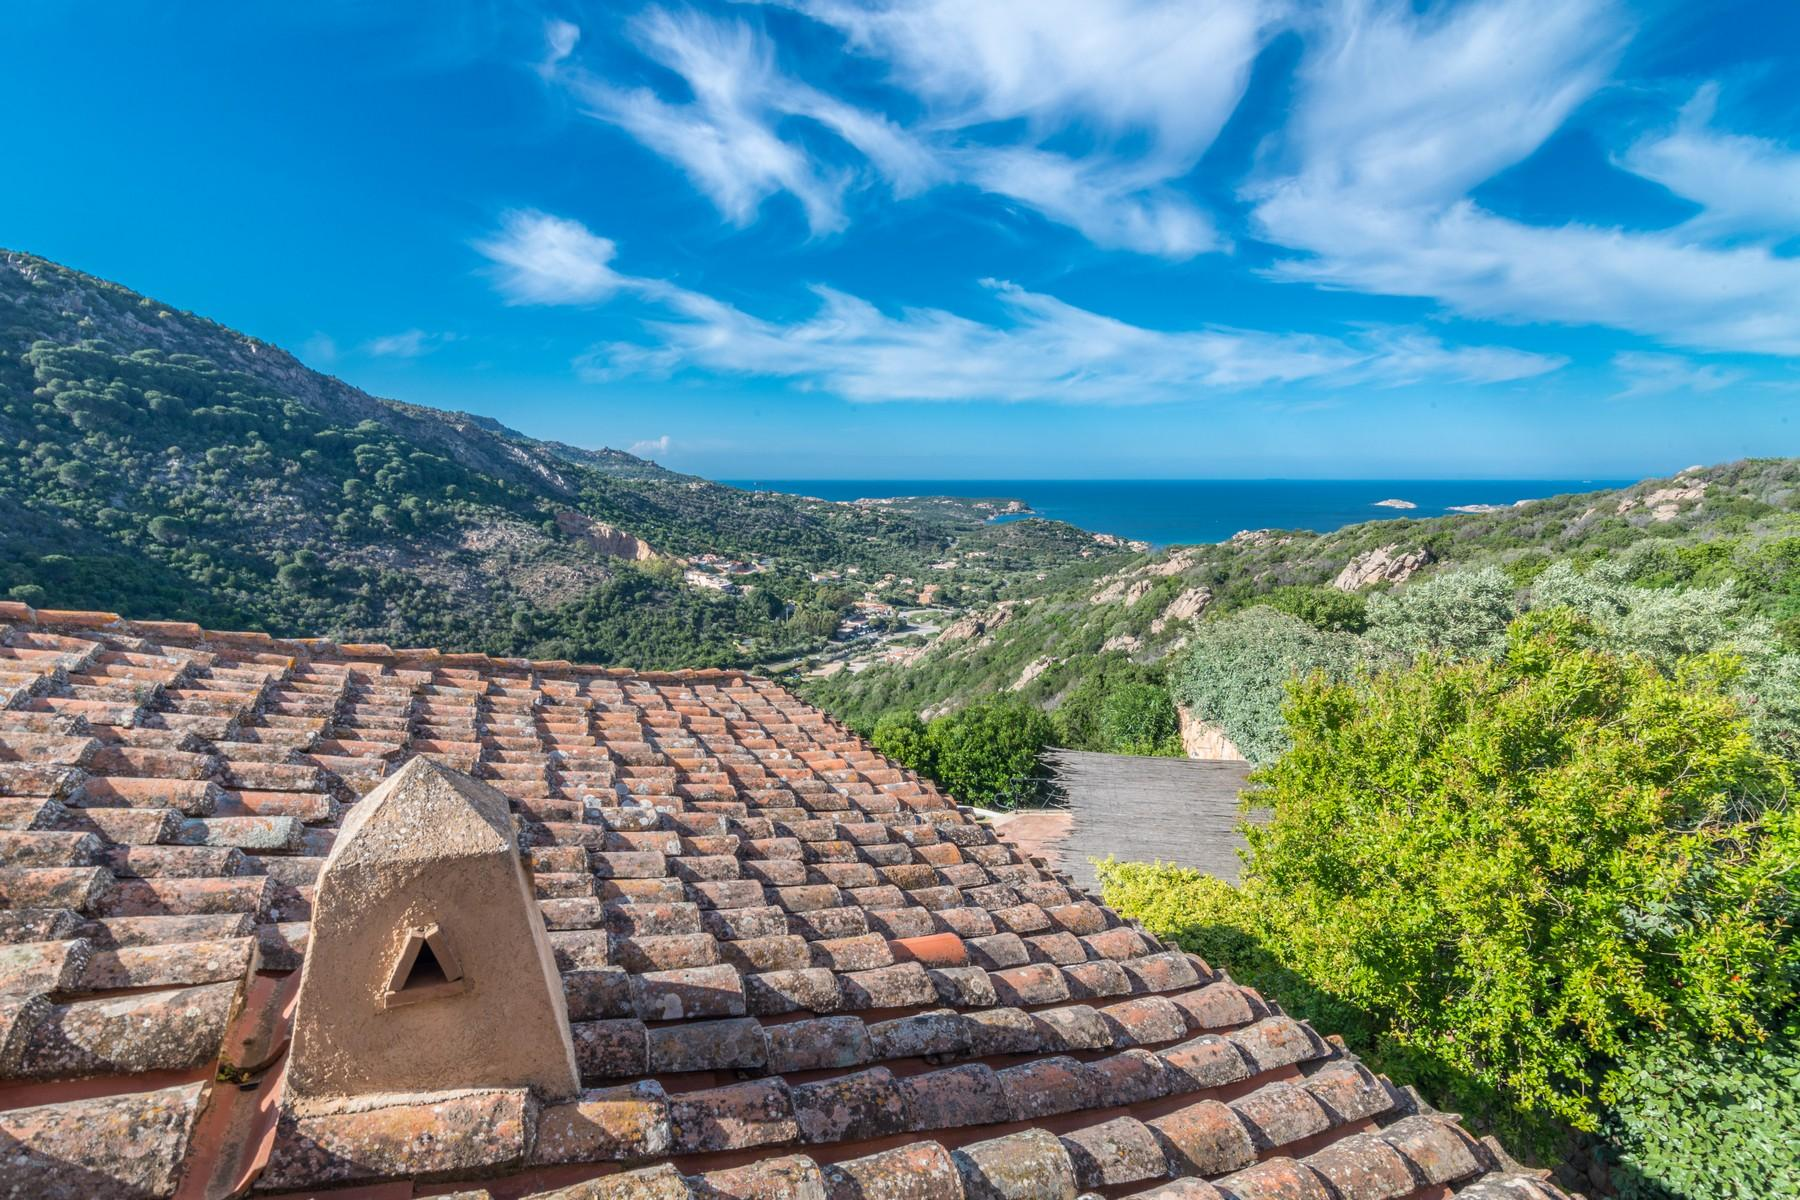 Porto Cervo Abbiadori Splendide villa jumelée avec vue sur le golfe de Pevero - 34